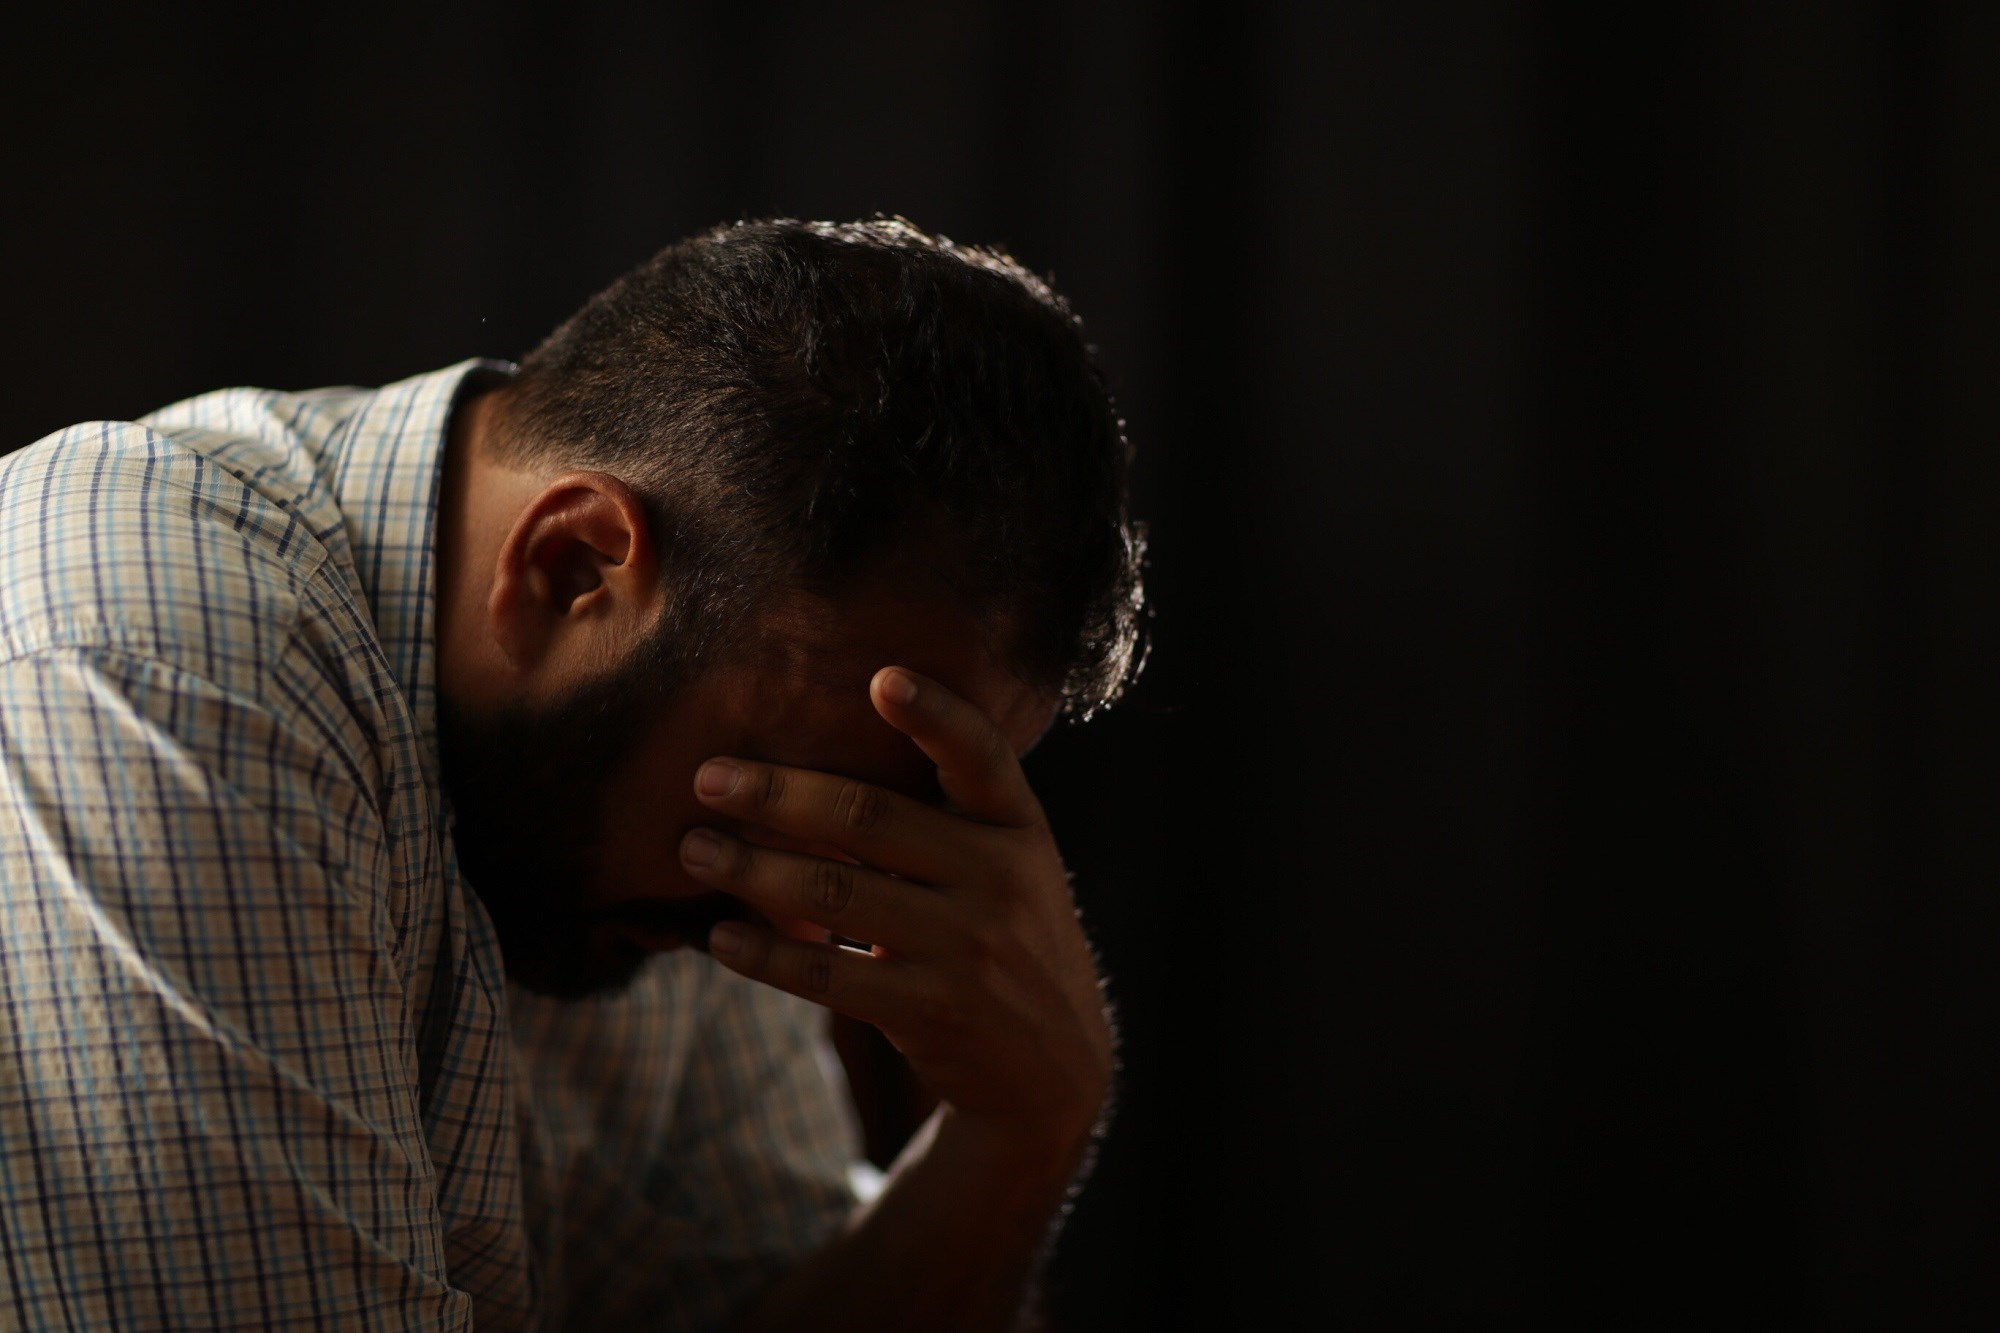 PTSD, Depressive Symptoms Mediate Relationship Between Insomnia and Risk for Suicidal Behavior